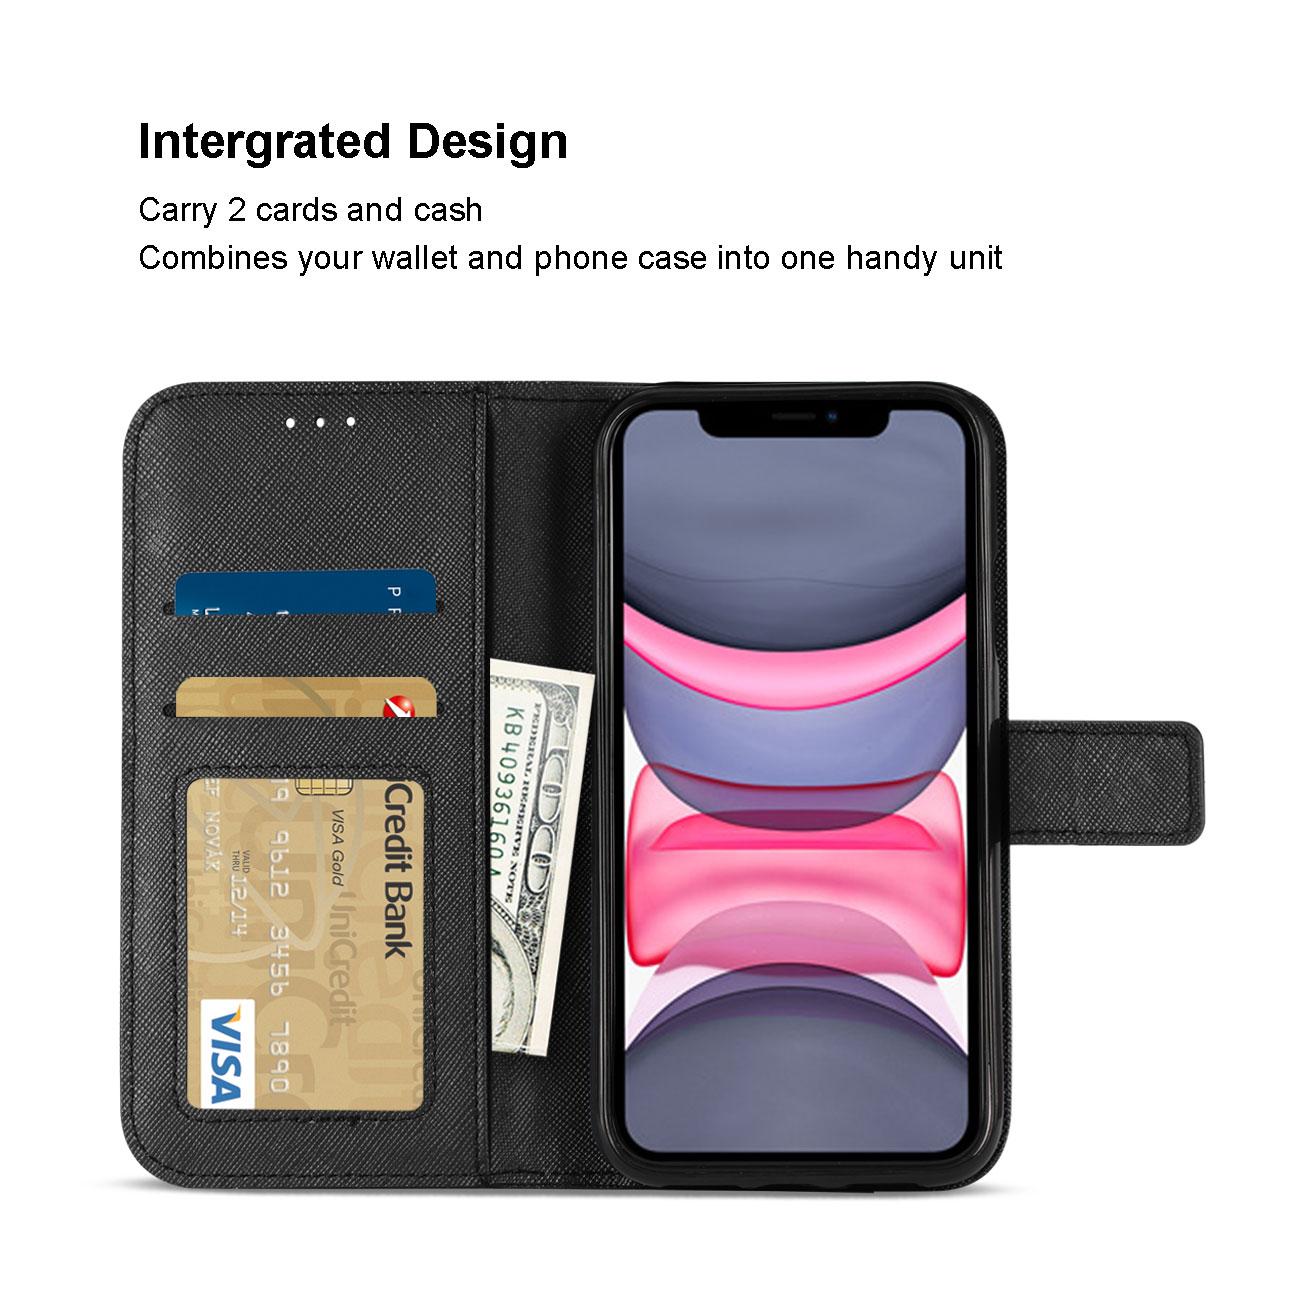 APPLE IPHONE 11 3-In-1 Wallet Case In BLACK